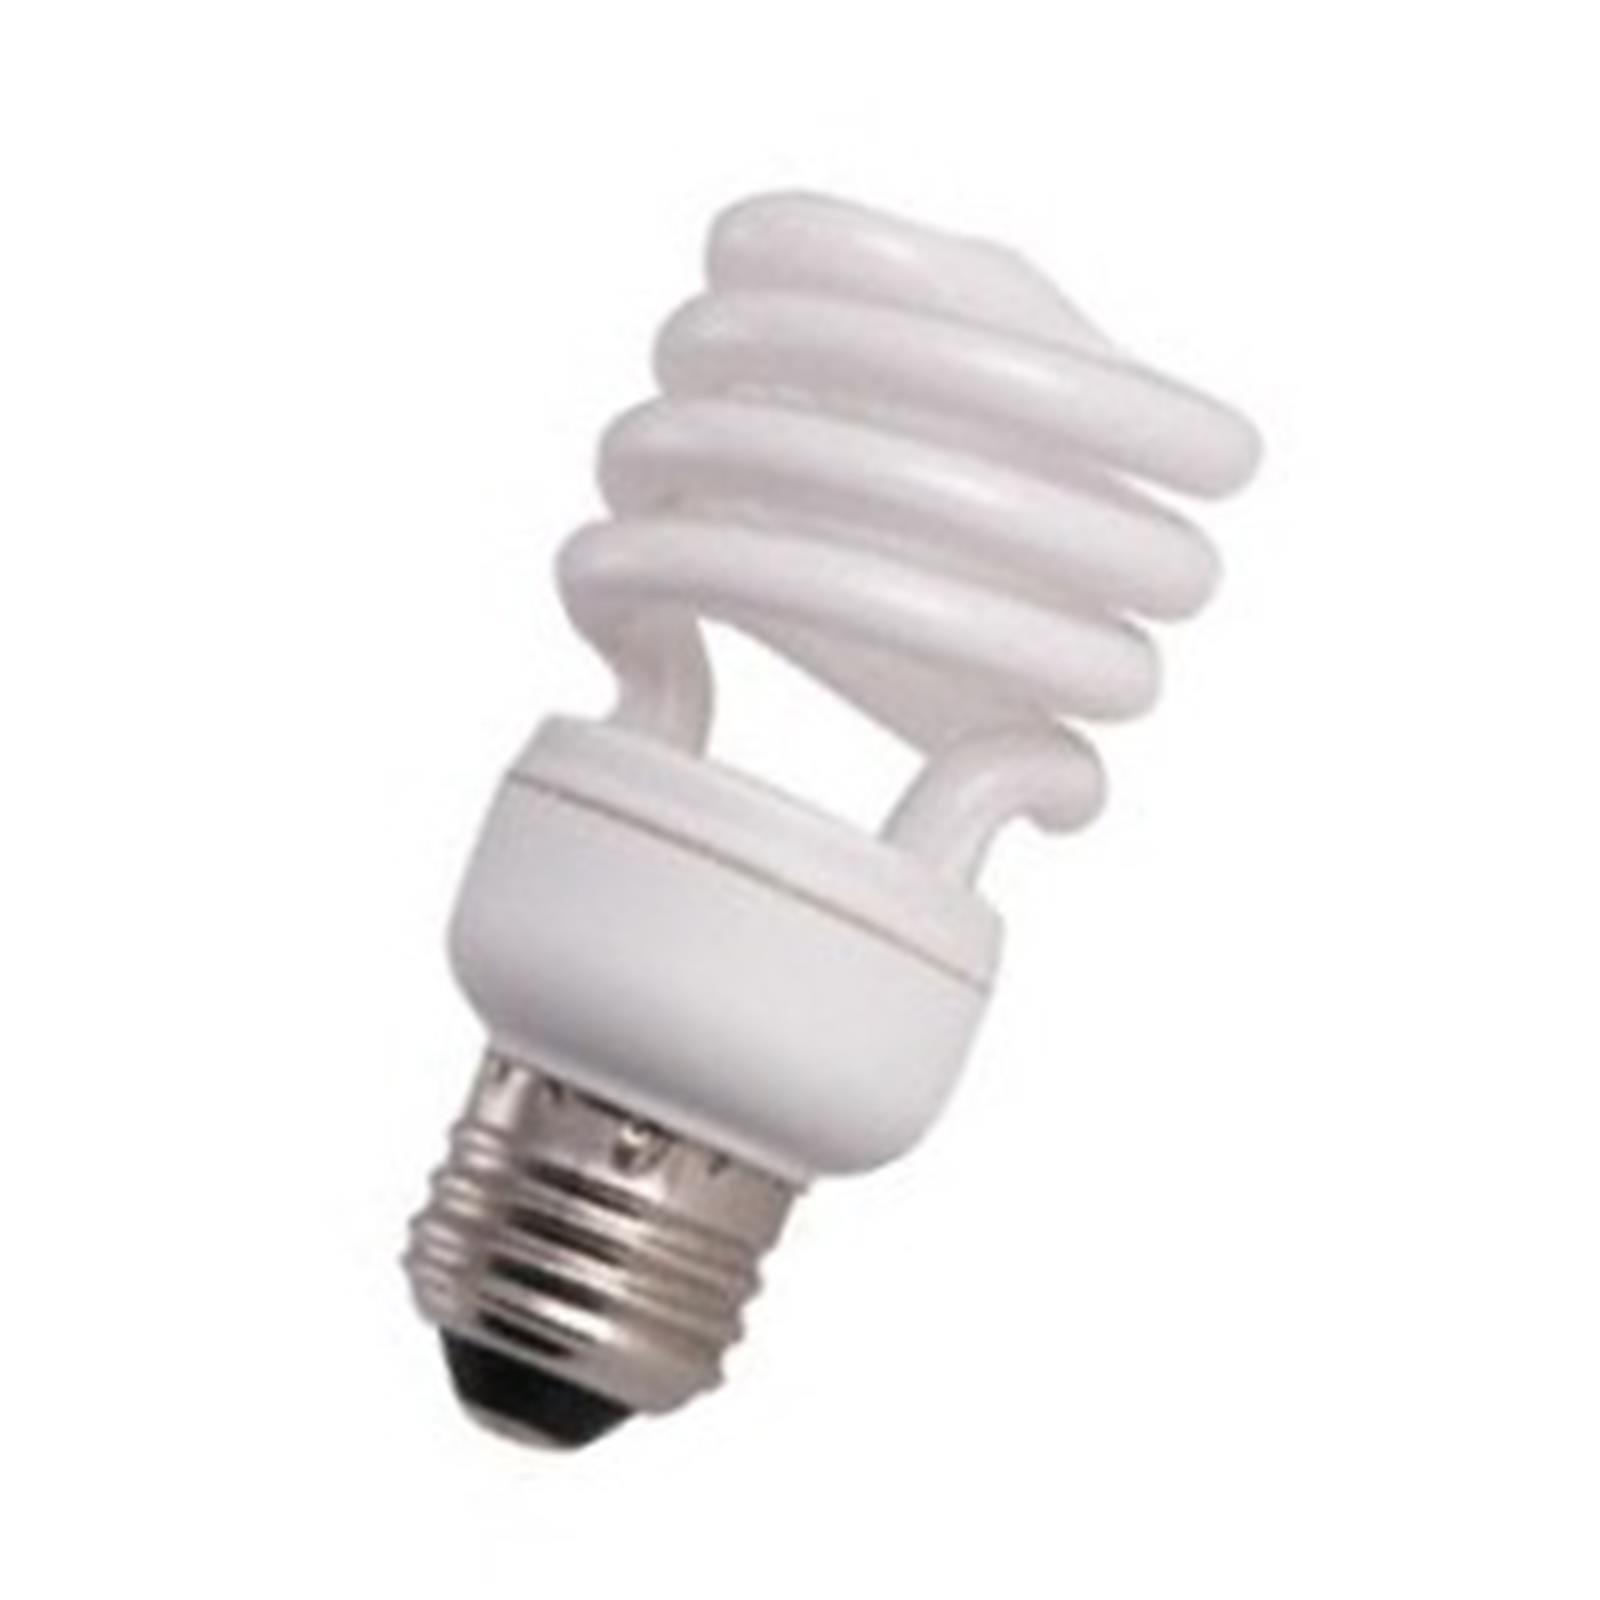 10 Qty. Halco 13W T2 Spiral 2700K Med ProLume CFL13/27/T2 13w 120v CFL Warm White Lamp Bulb